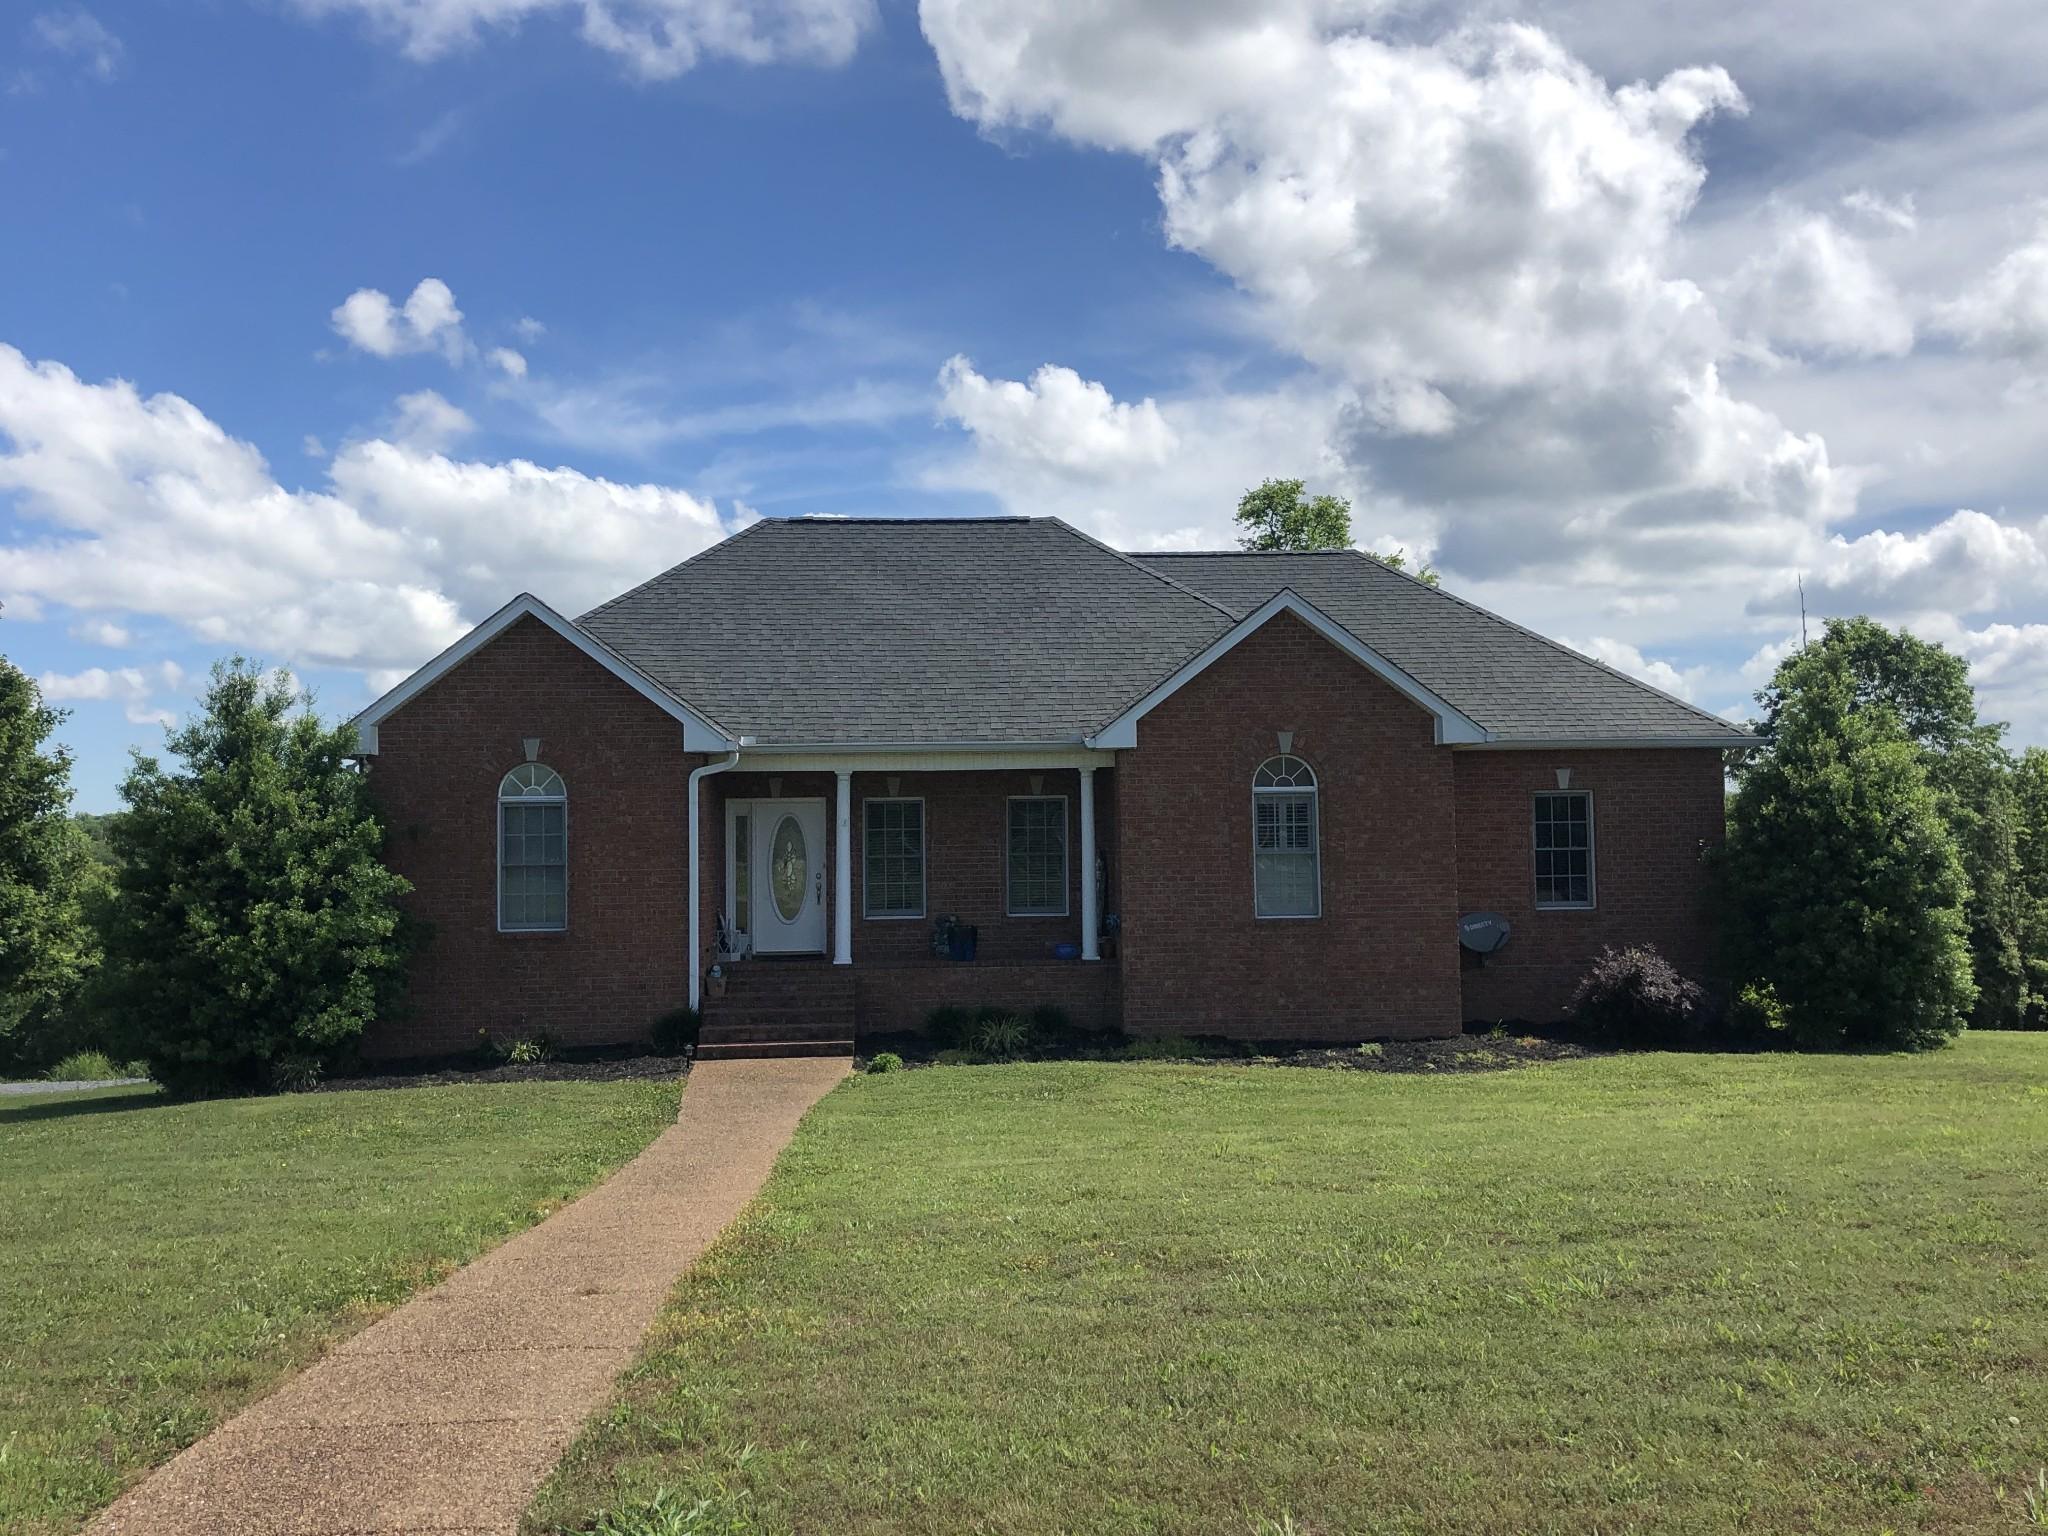 1012 Tom Mabrey Dr Property Photo - Castalian Springs, TN real estate listing